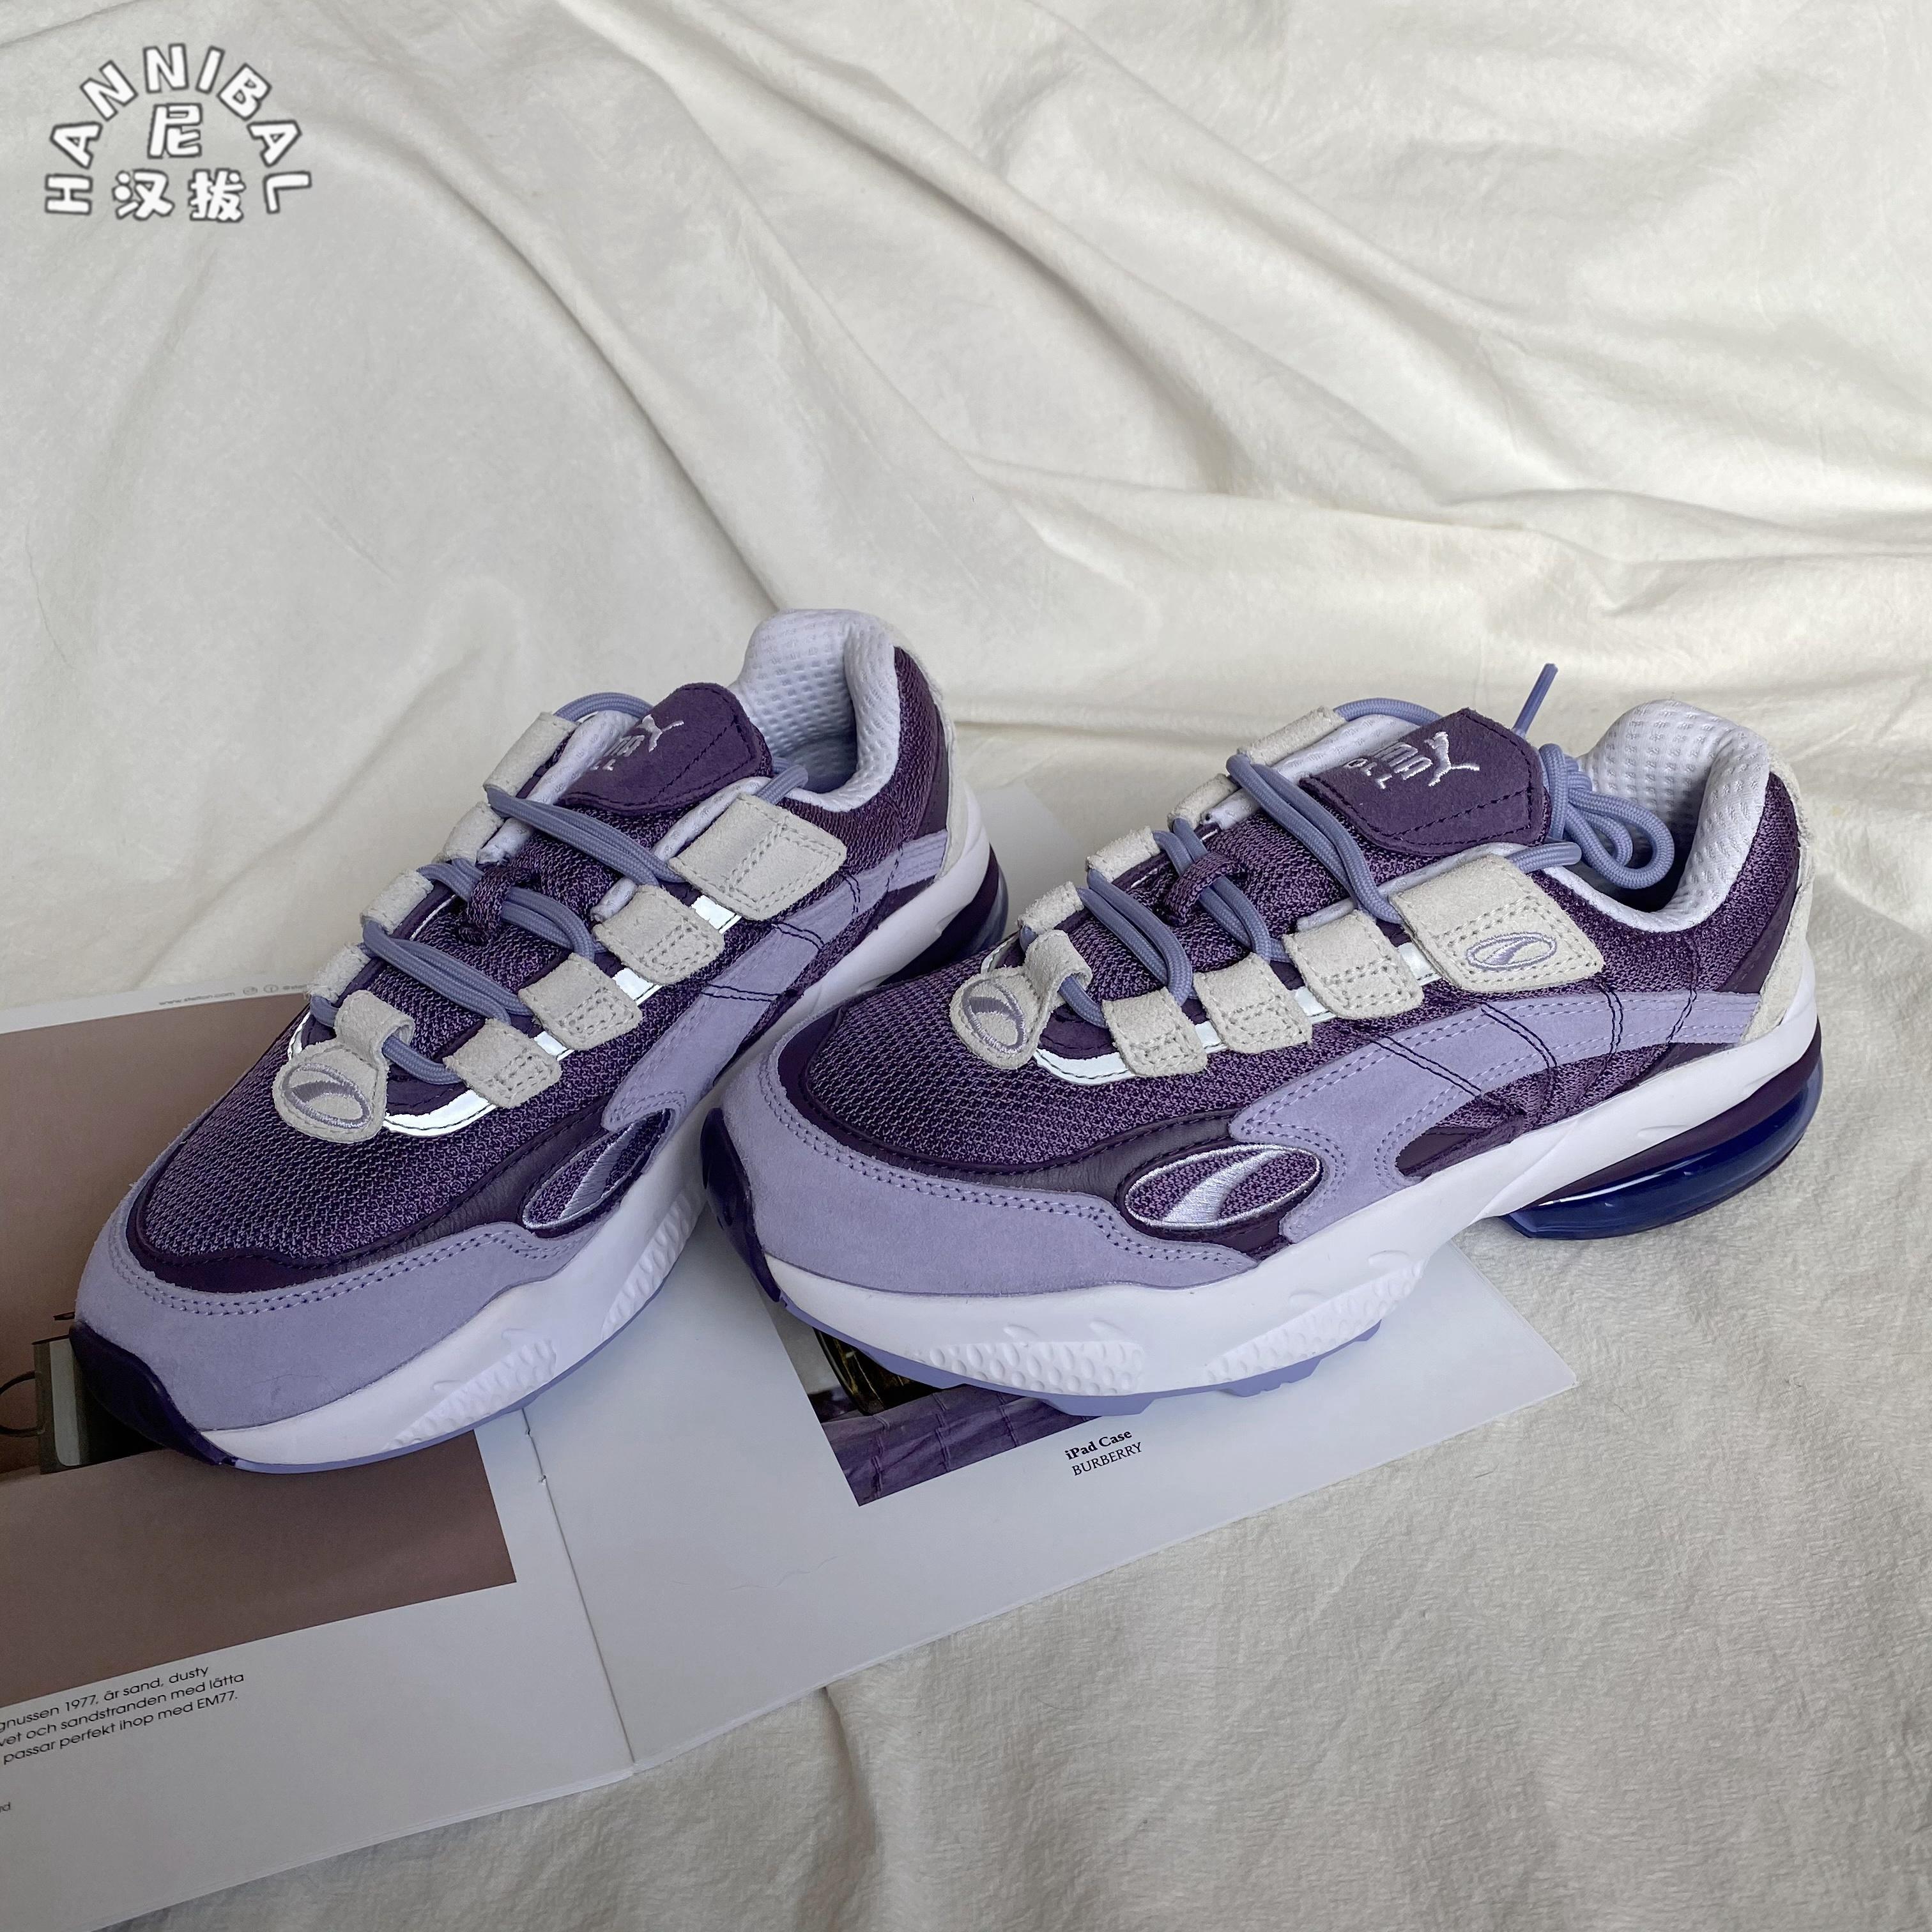 Puma彪马 CELL Venom 香芋紫罗兰白紫色女复古气垫跑鞋370741-06